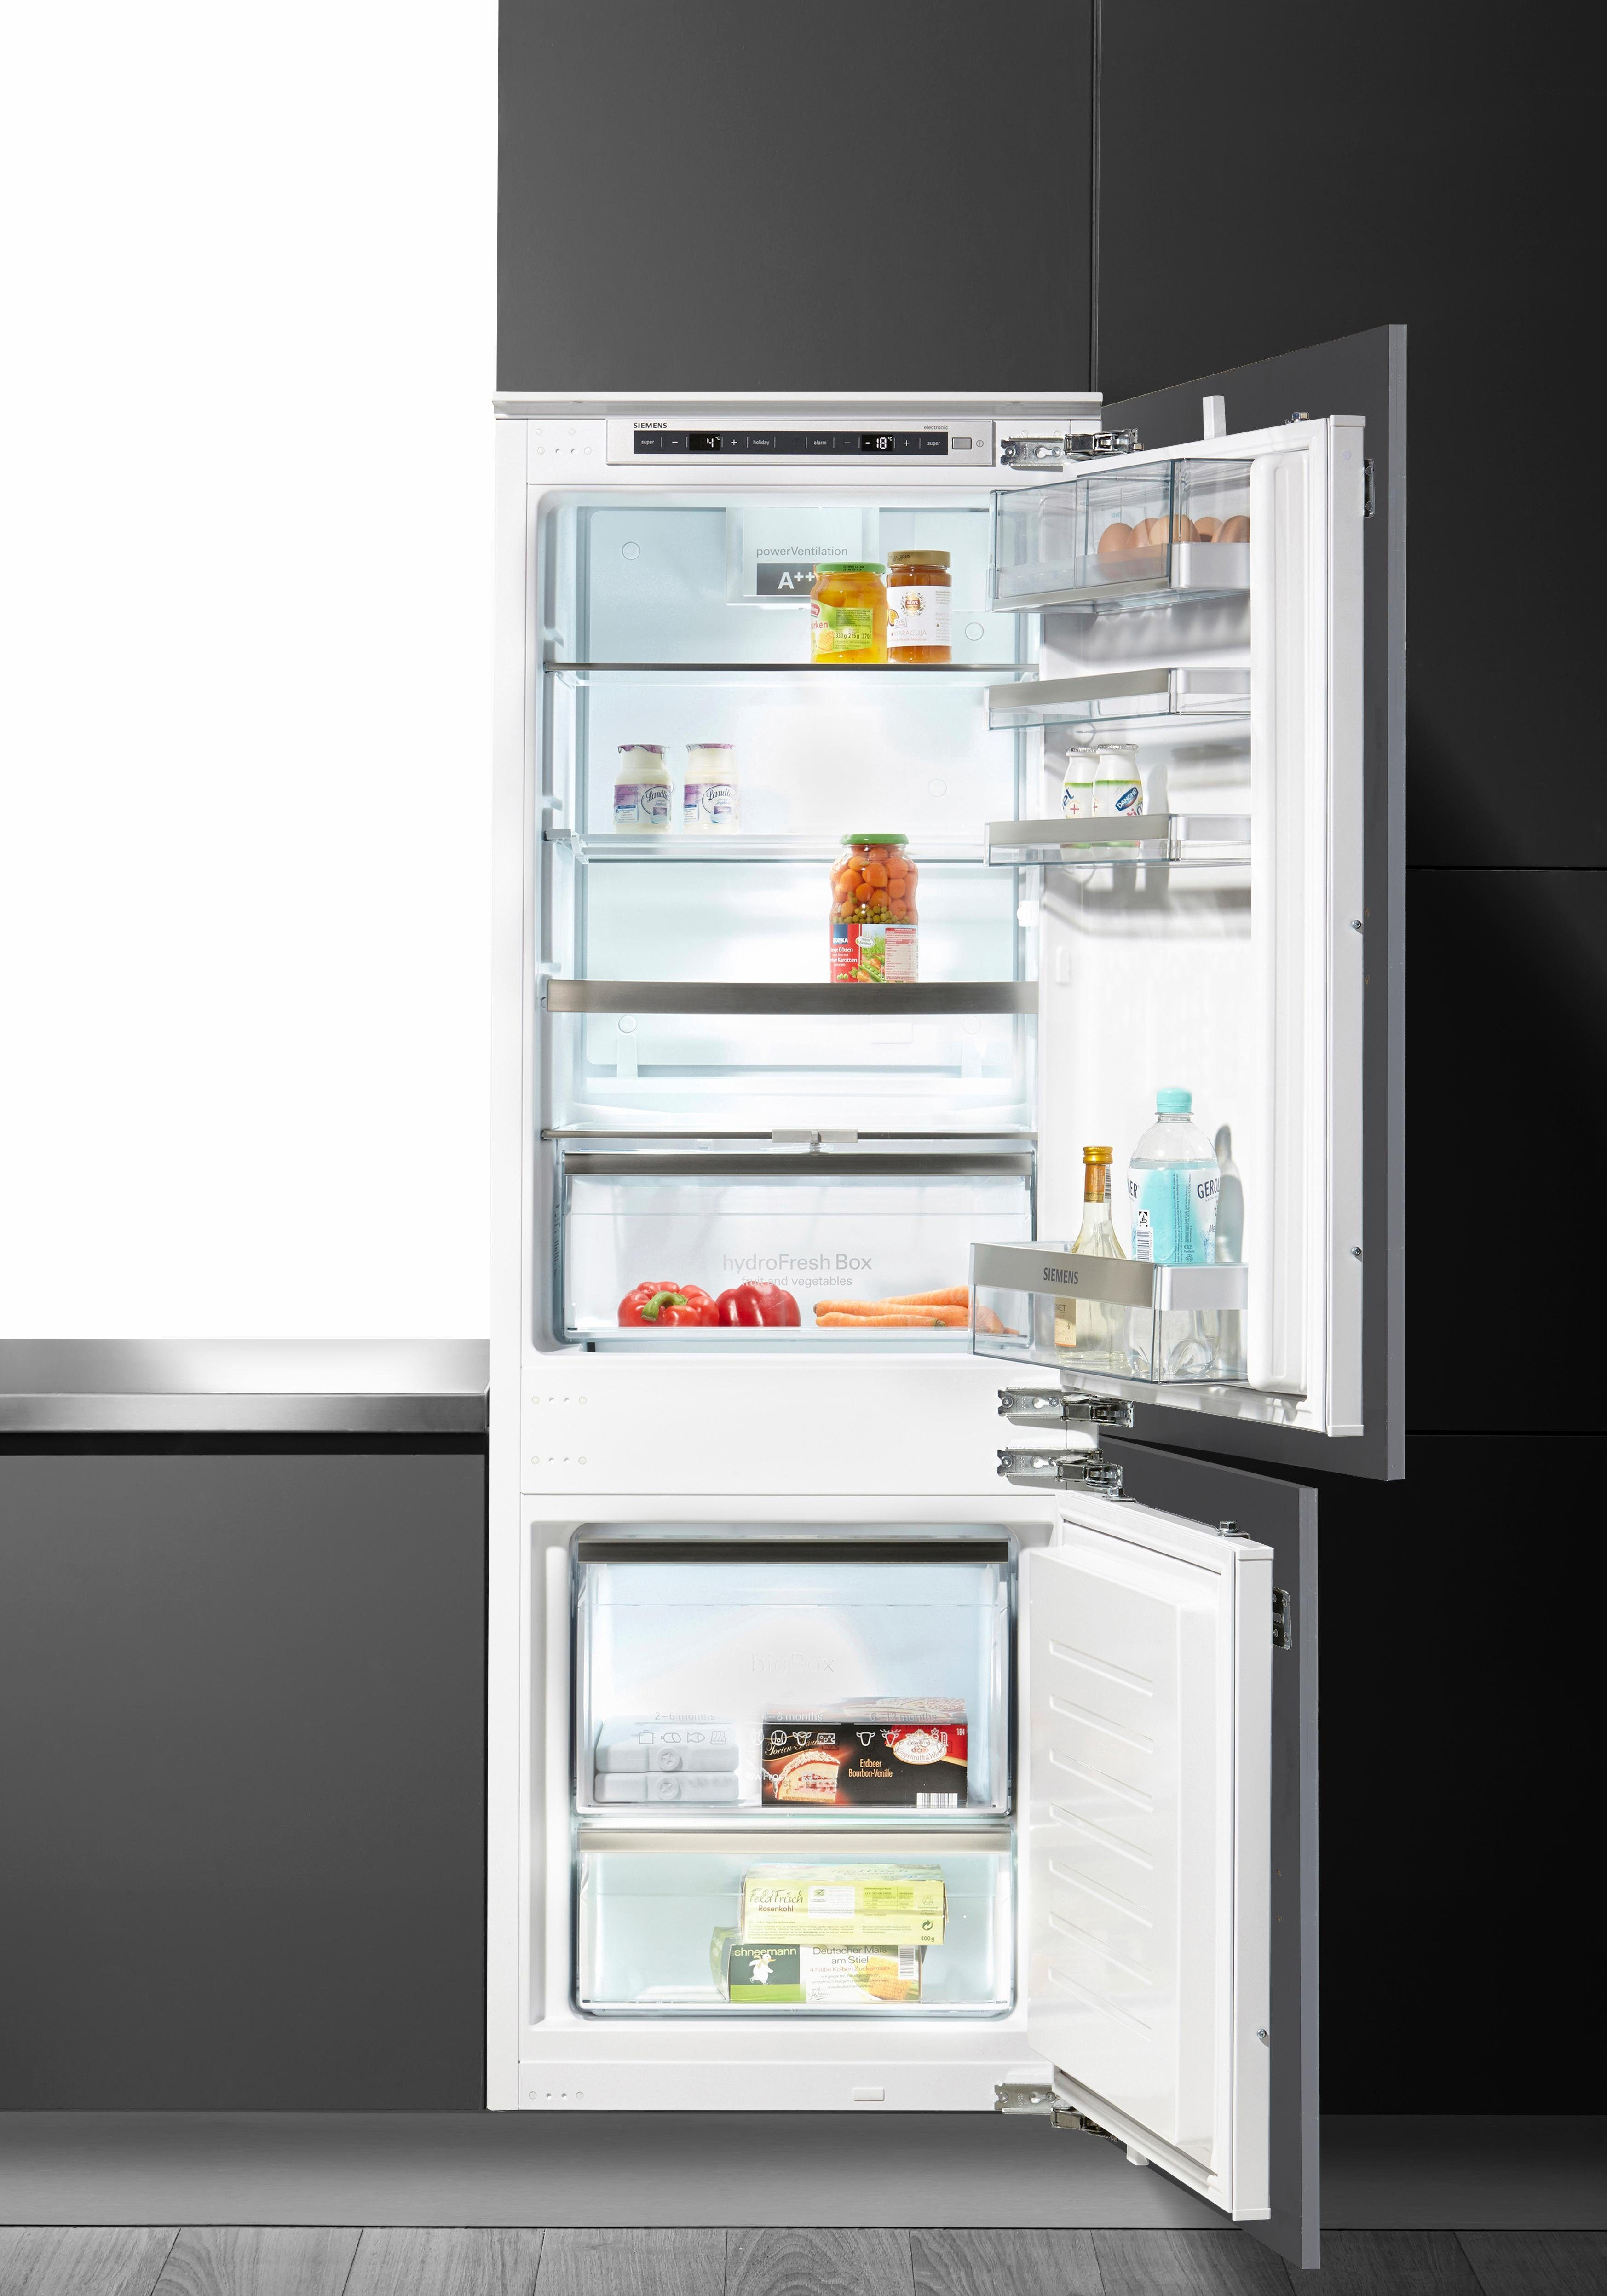 Siemens Einbau-Kühl-Gefrier-Kombination FLA KI77SAD40, A+++, 157,8 cm hoch